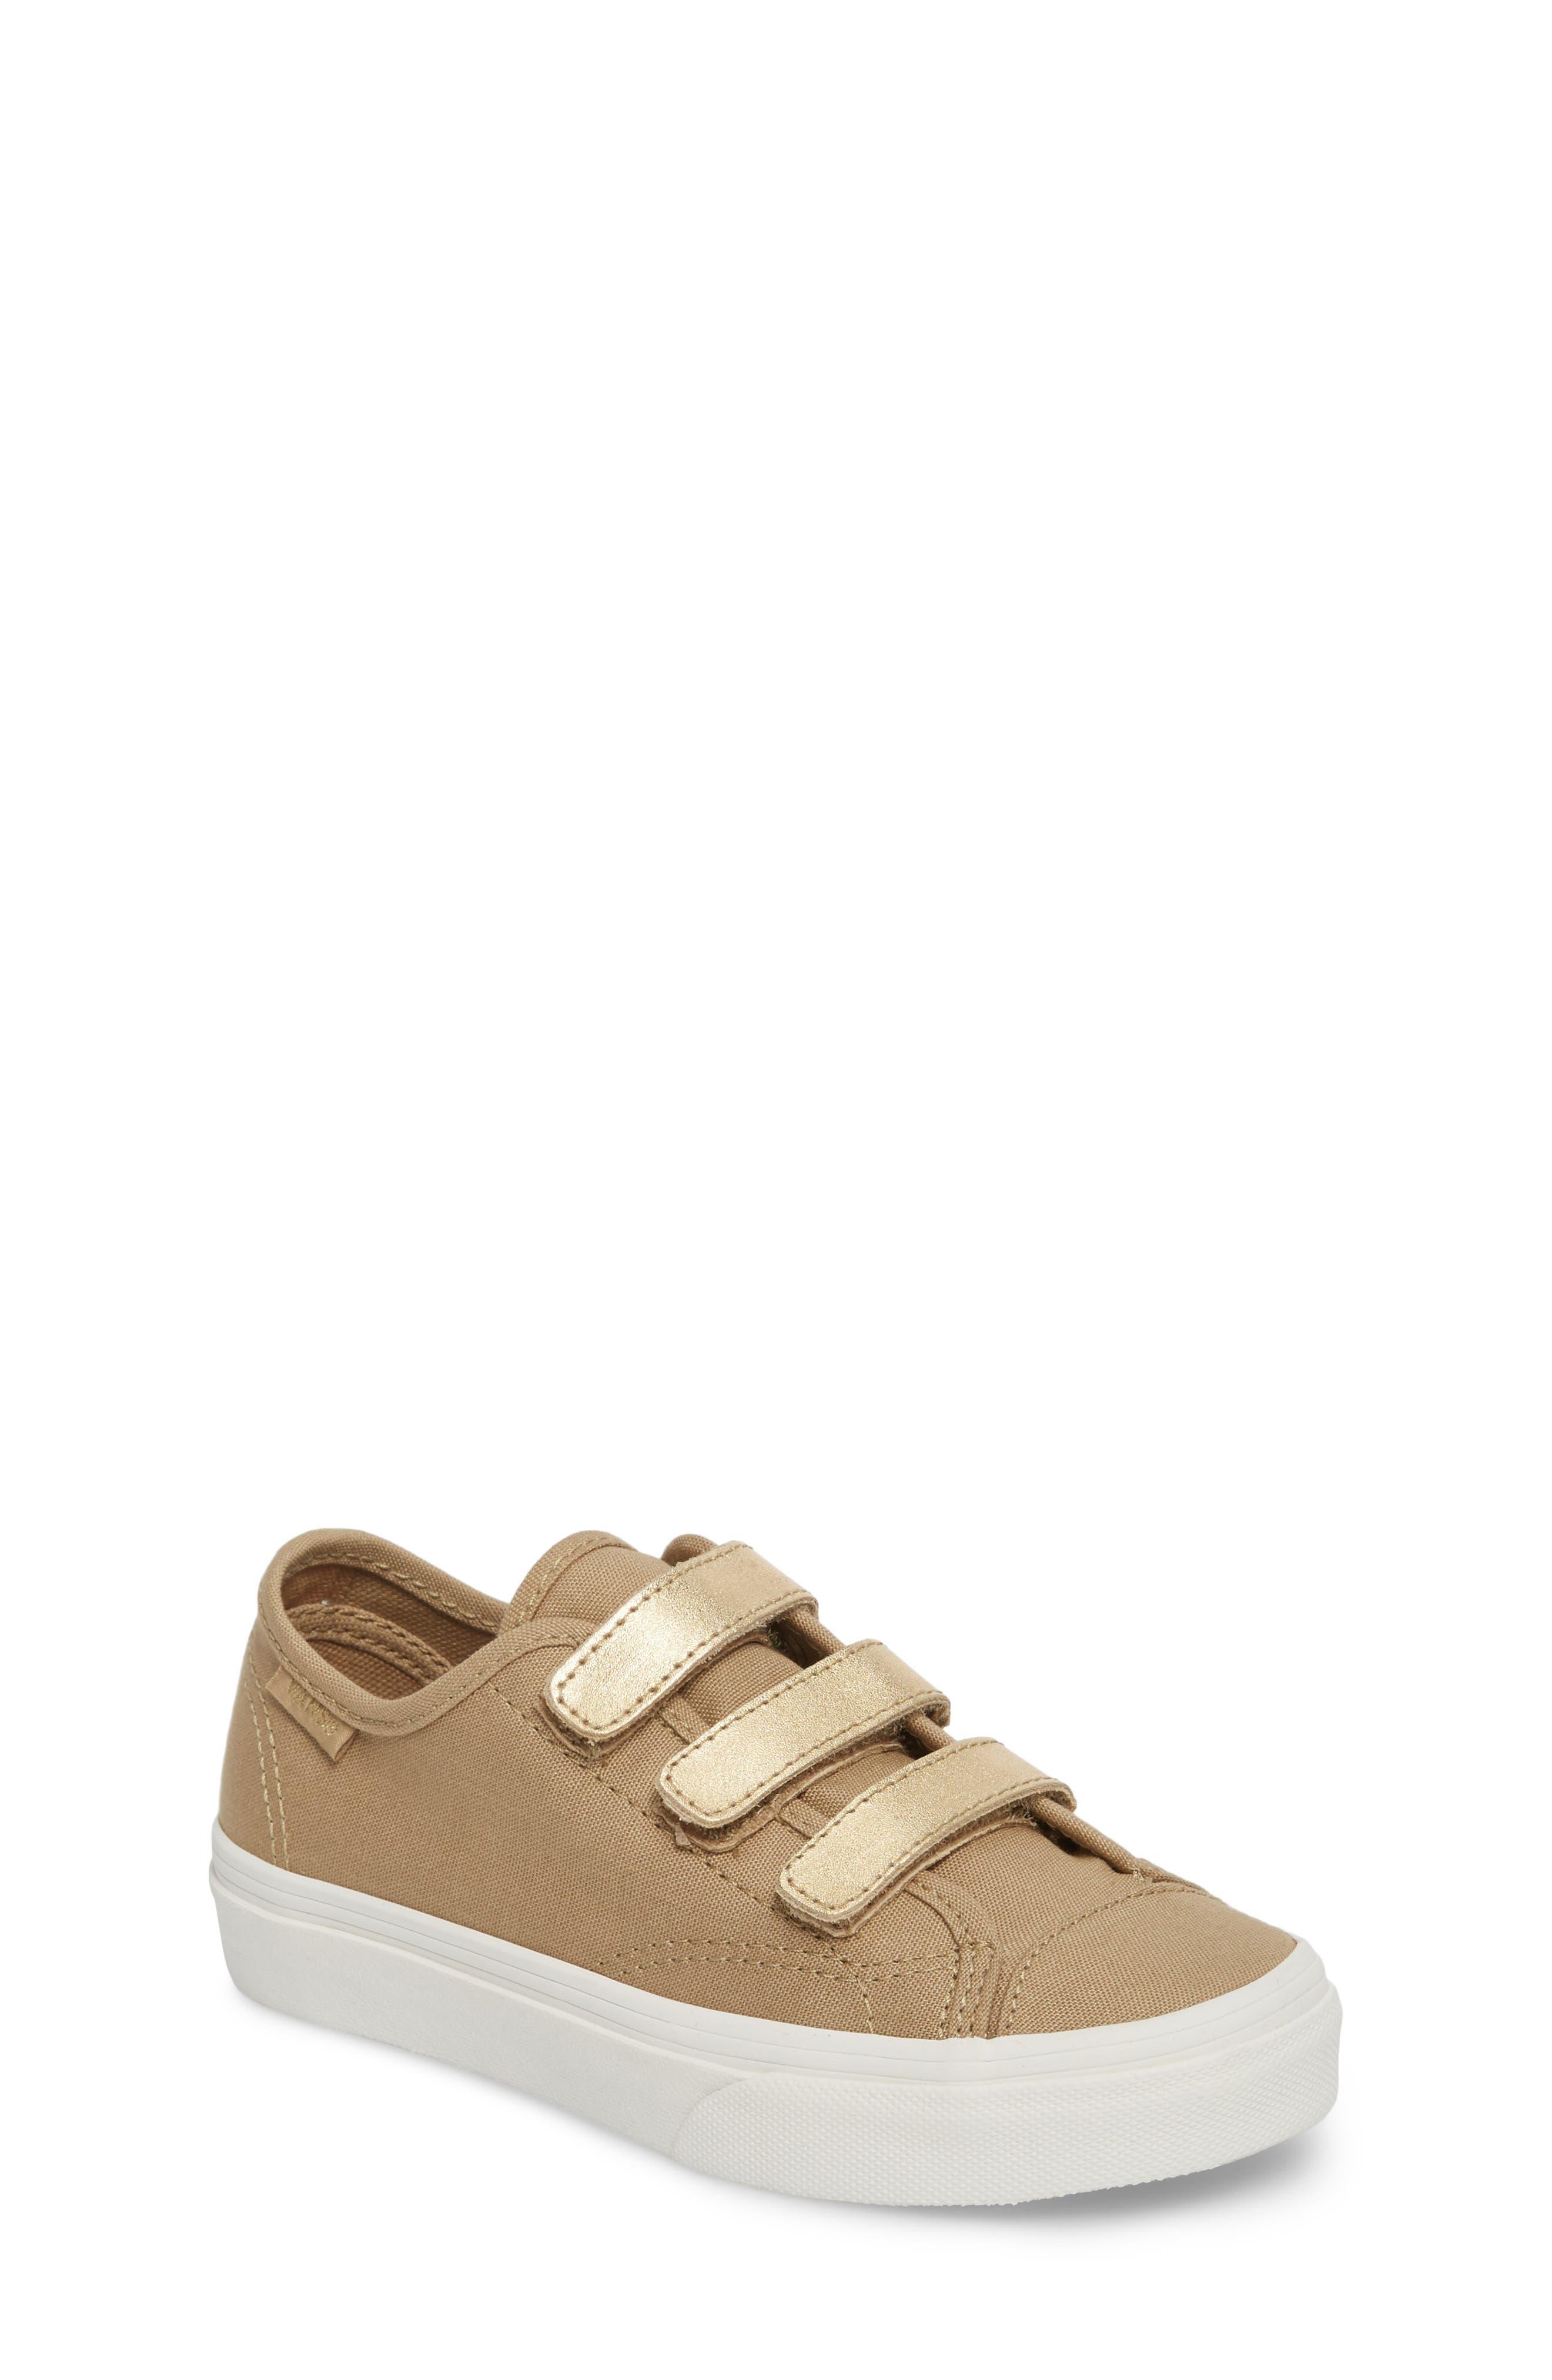 Style 23V Sneaker,                             Main thumbnail 1, color,                             Metallic/ Cornstalk